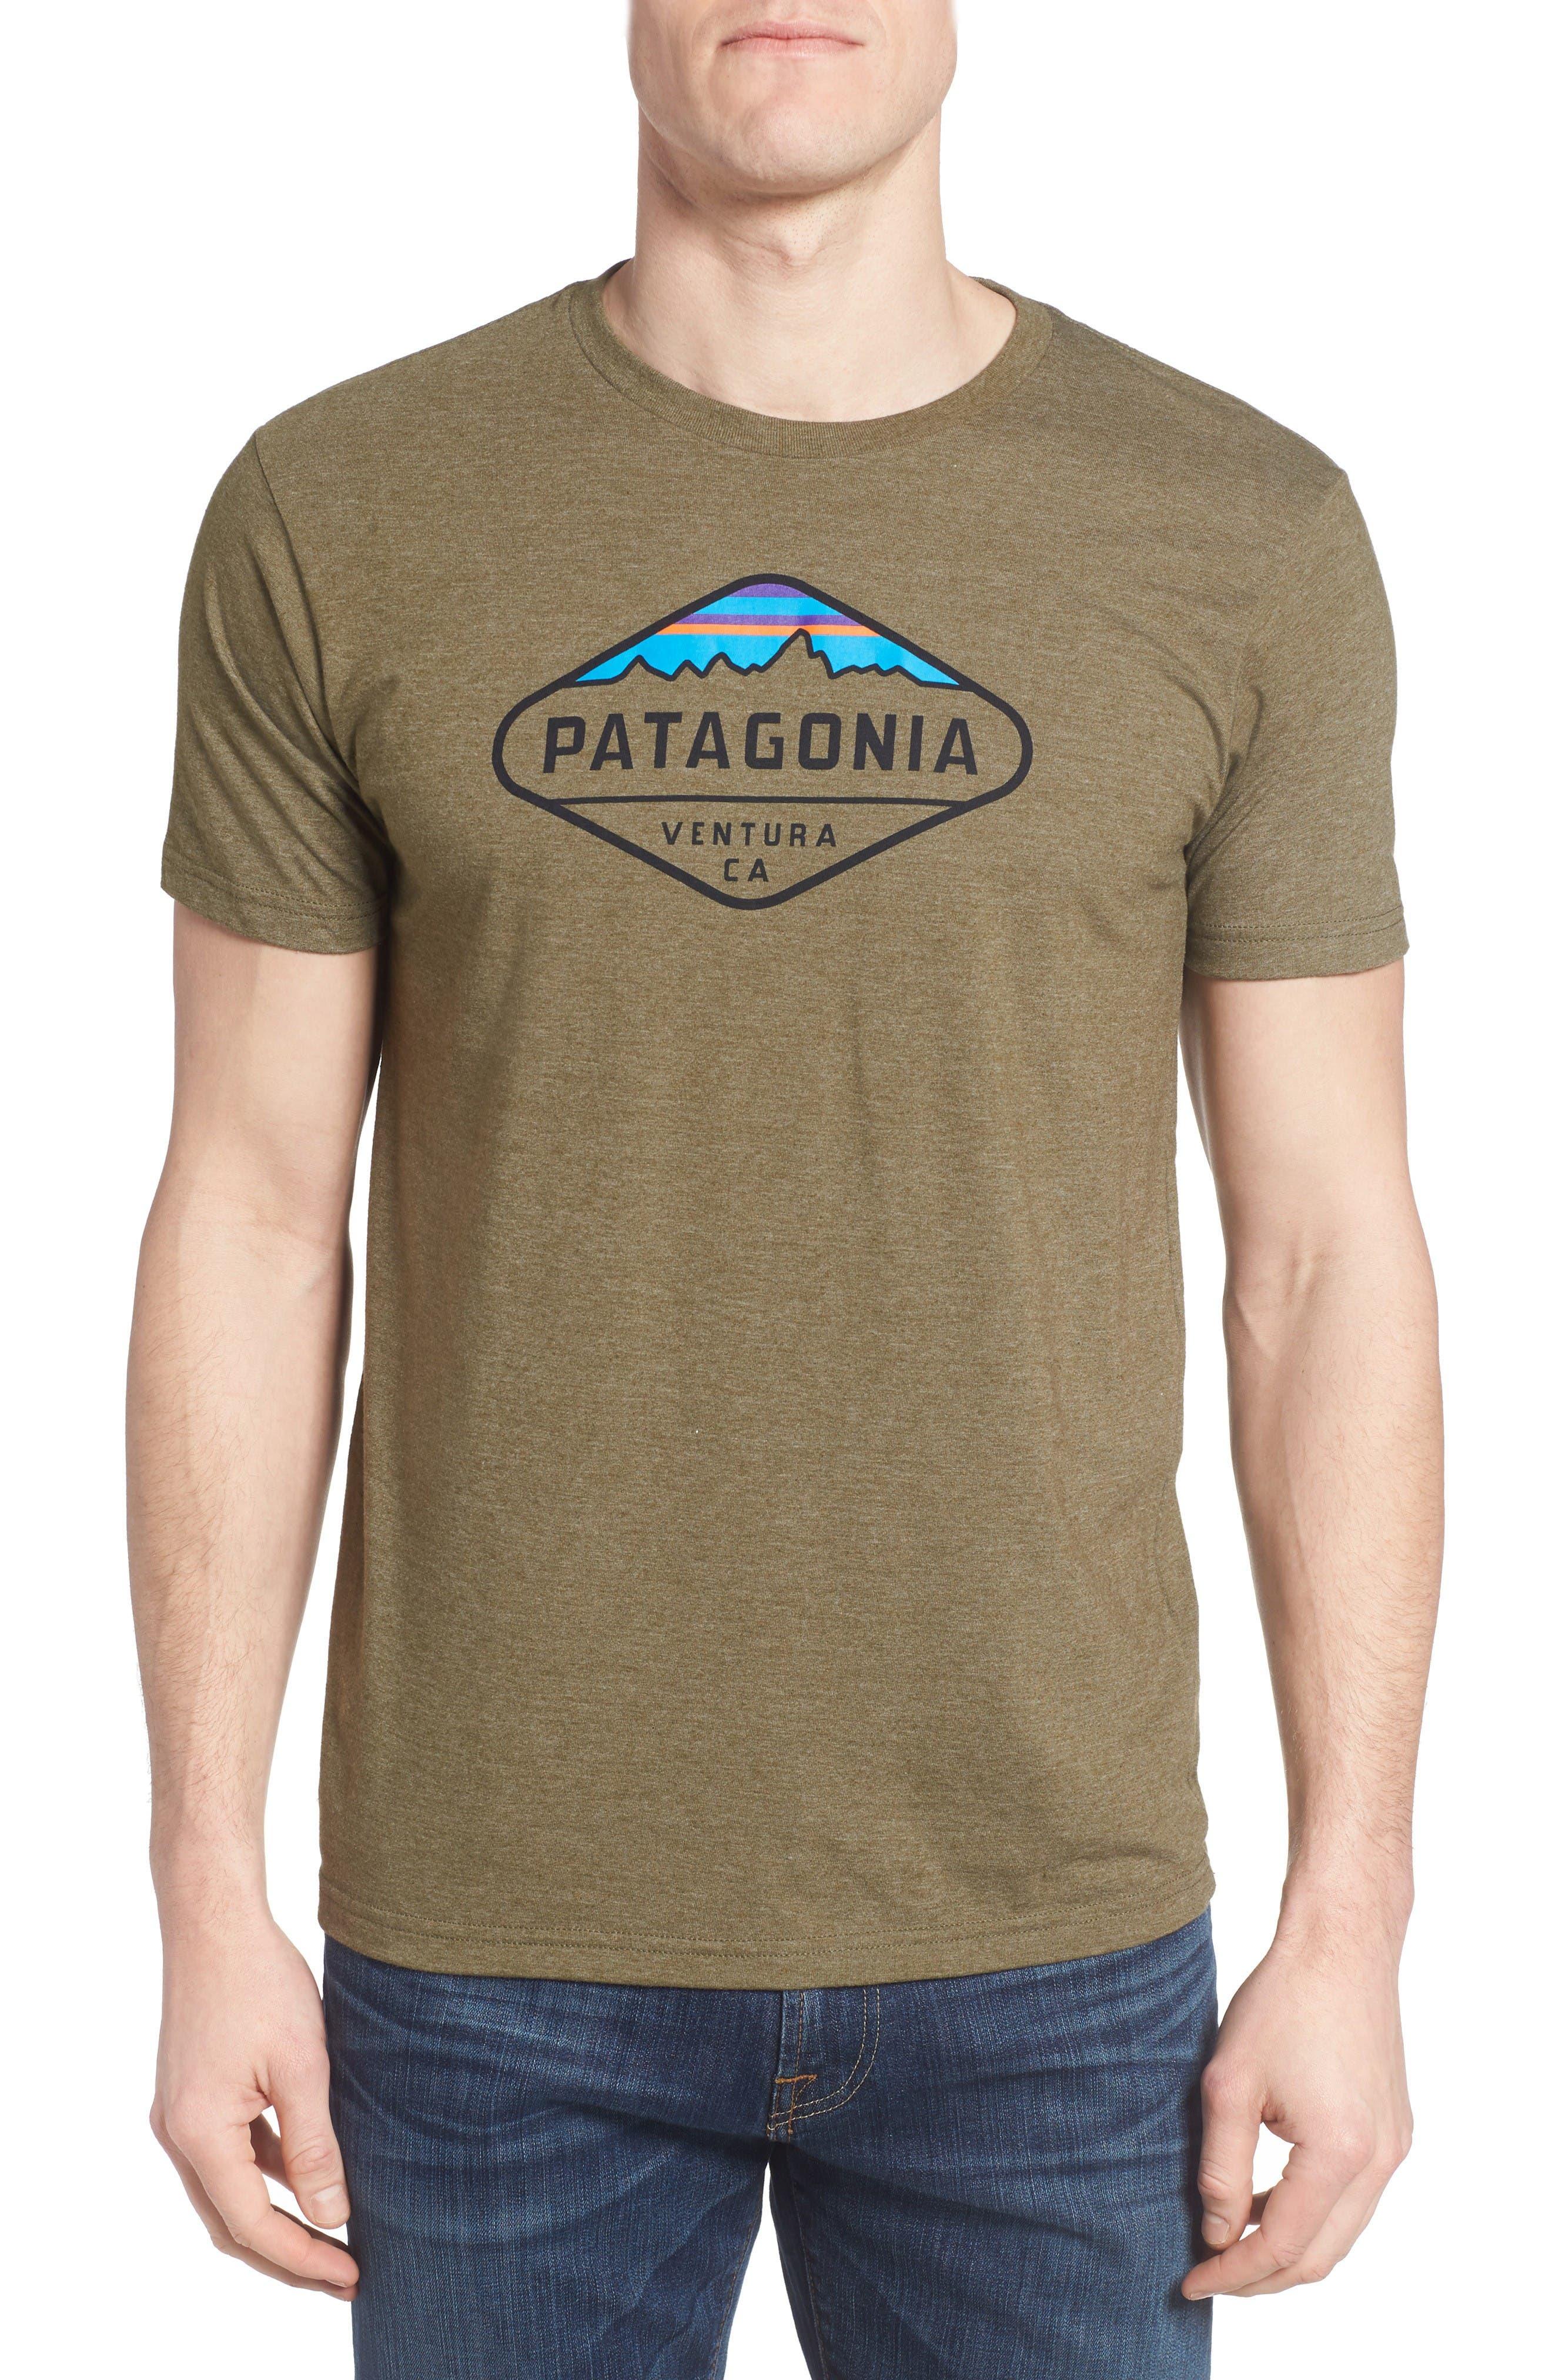 Patagonia 'Fitz Roy Crest' Slim Fit Organic Cotton Blend T-Shirt